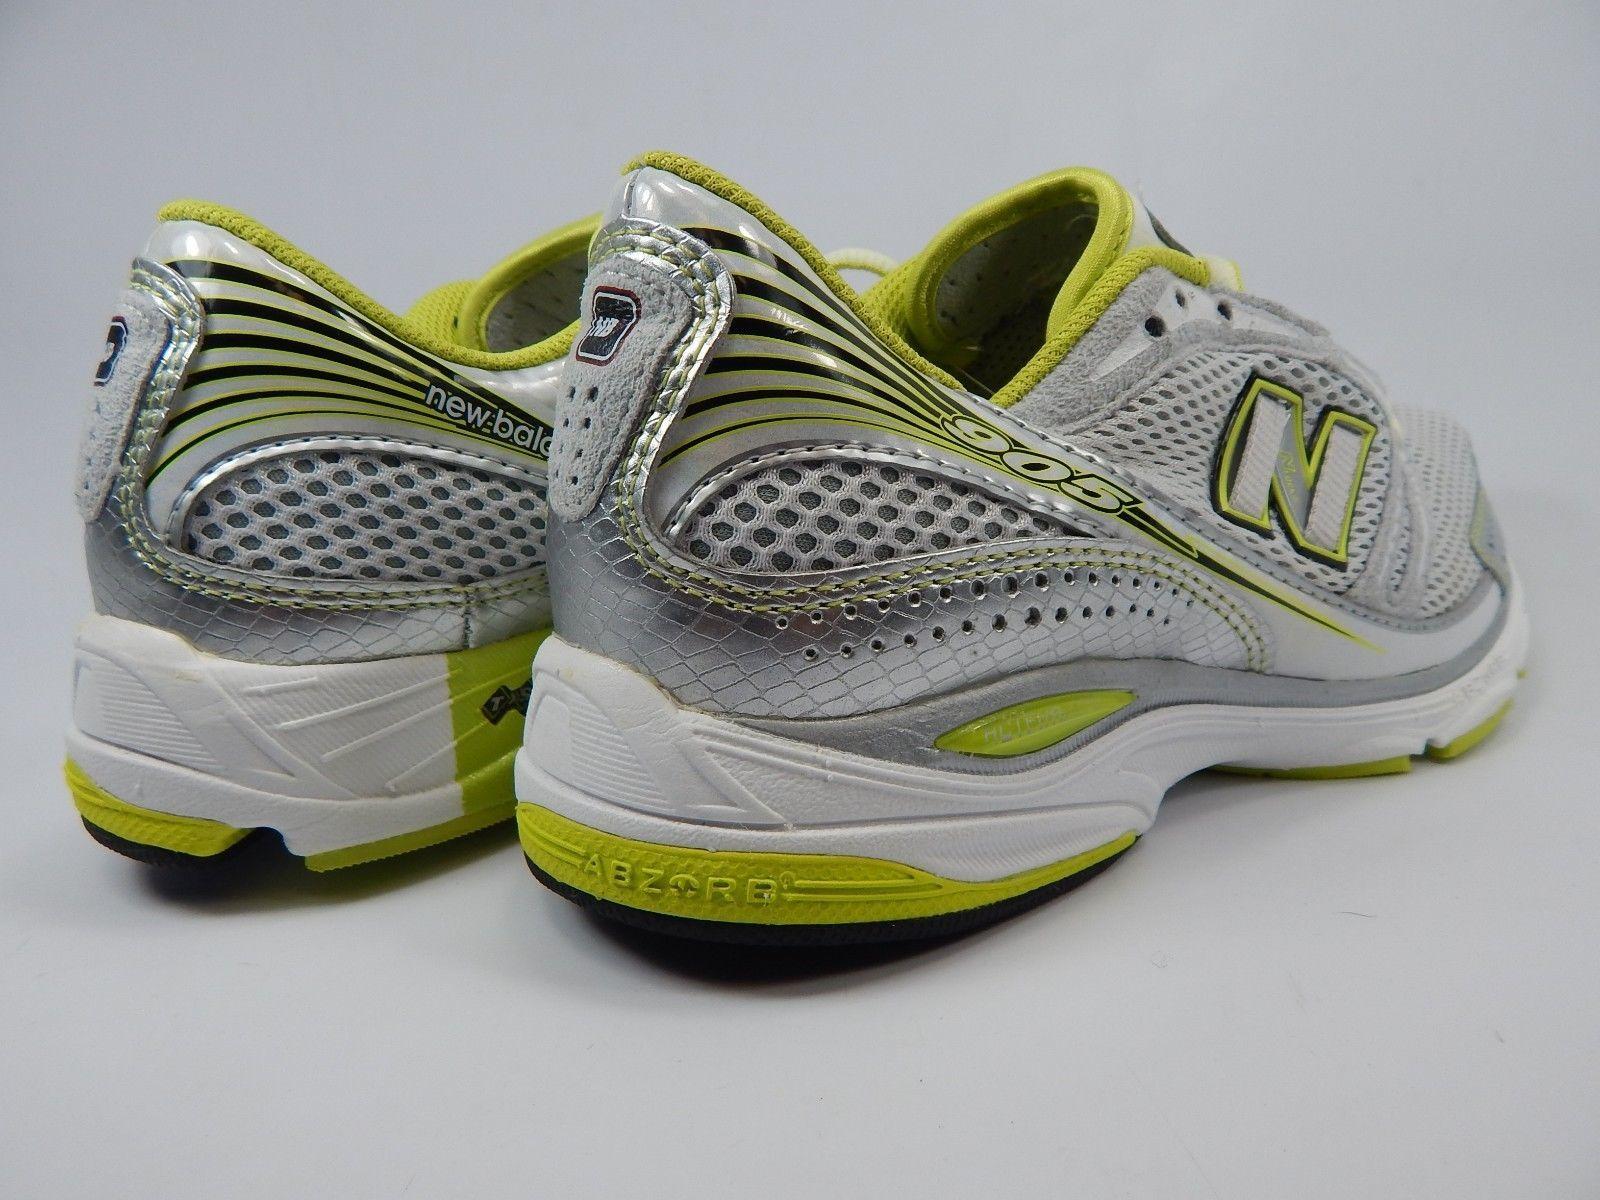 New Balance 905 Women's Running Shoes Size US 7 M (B) EU 37.5 White WR905WG